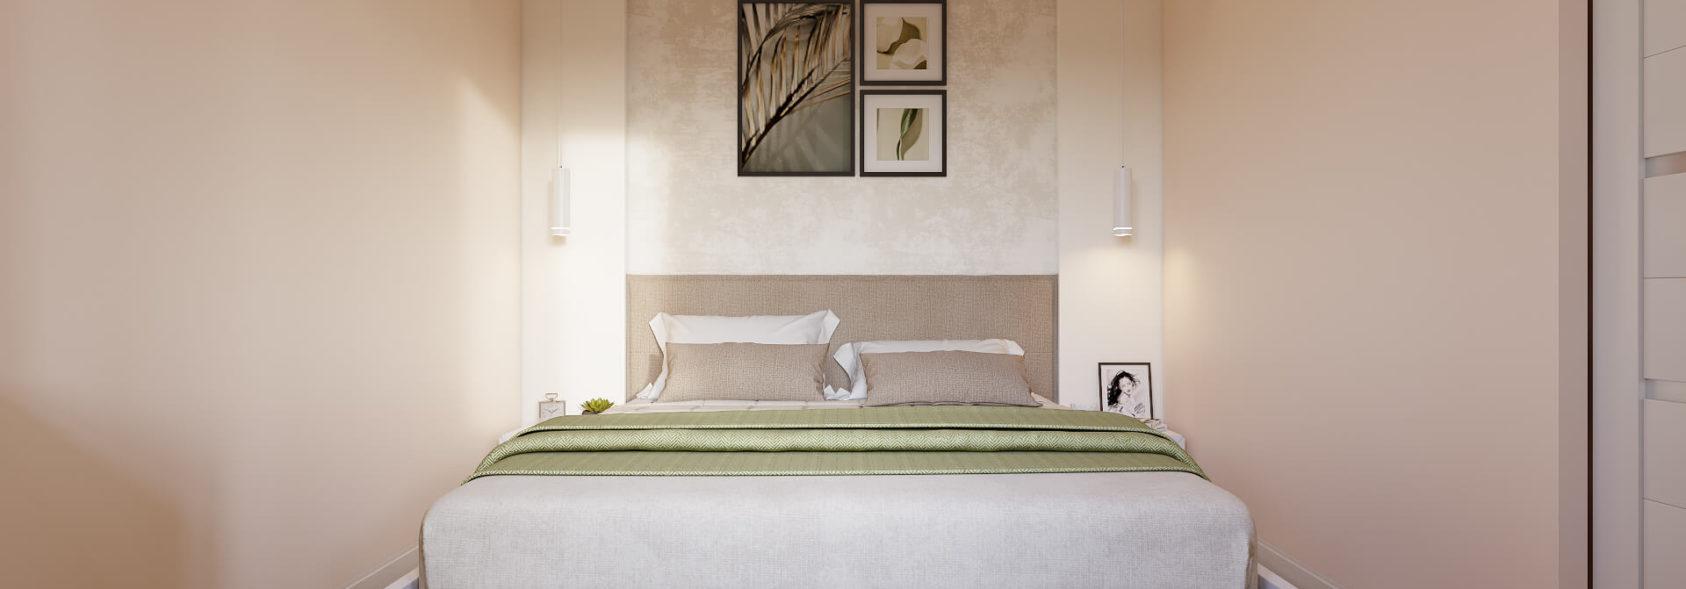 Интерьер спальни в 2х комнатной квартире Днепр